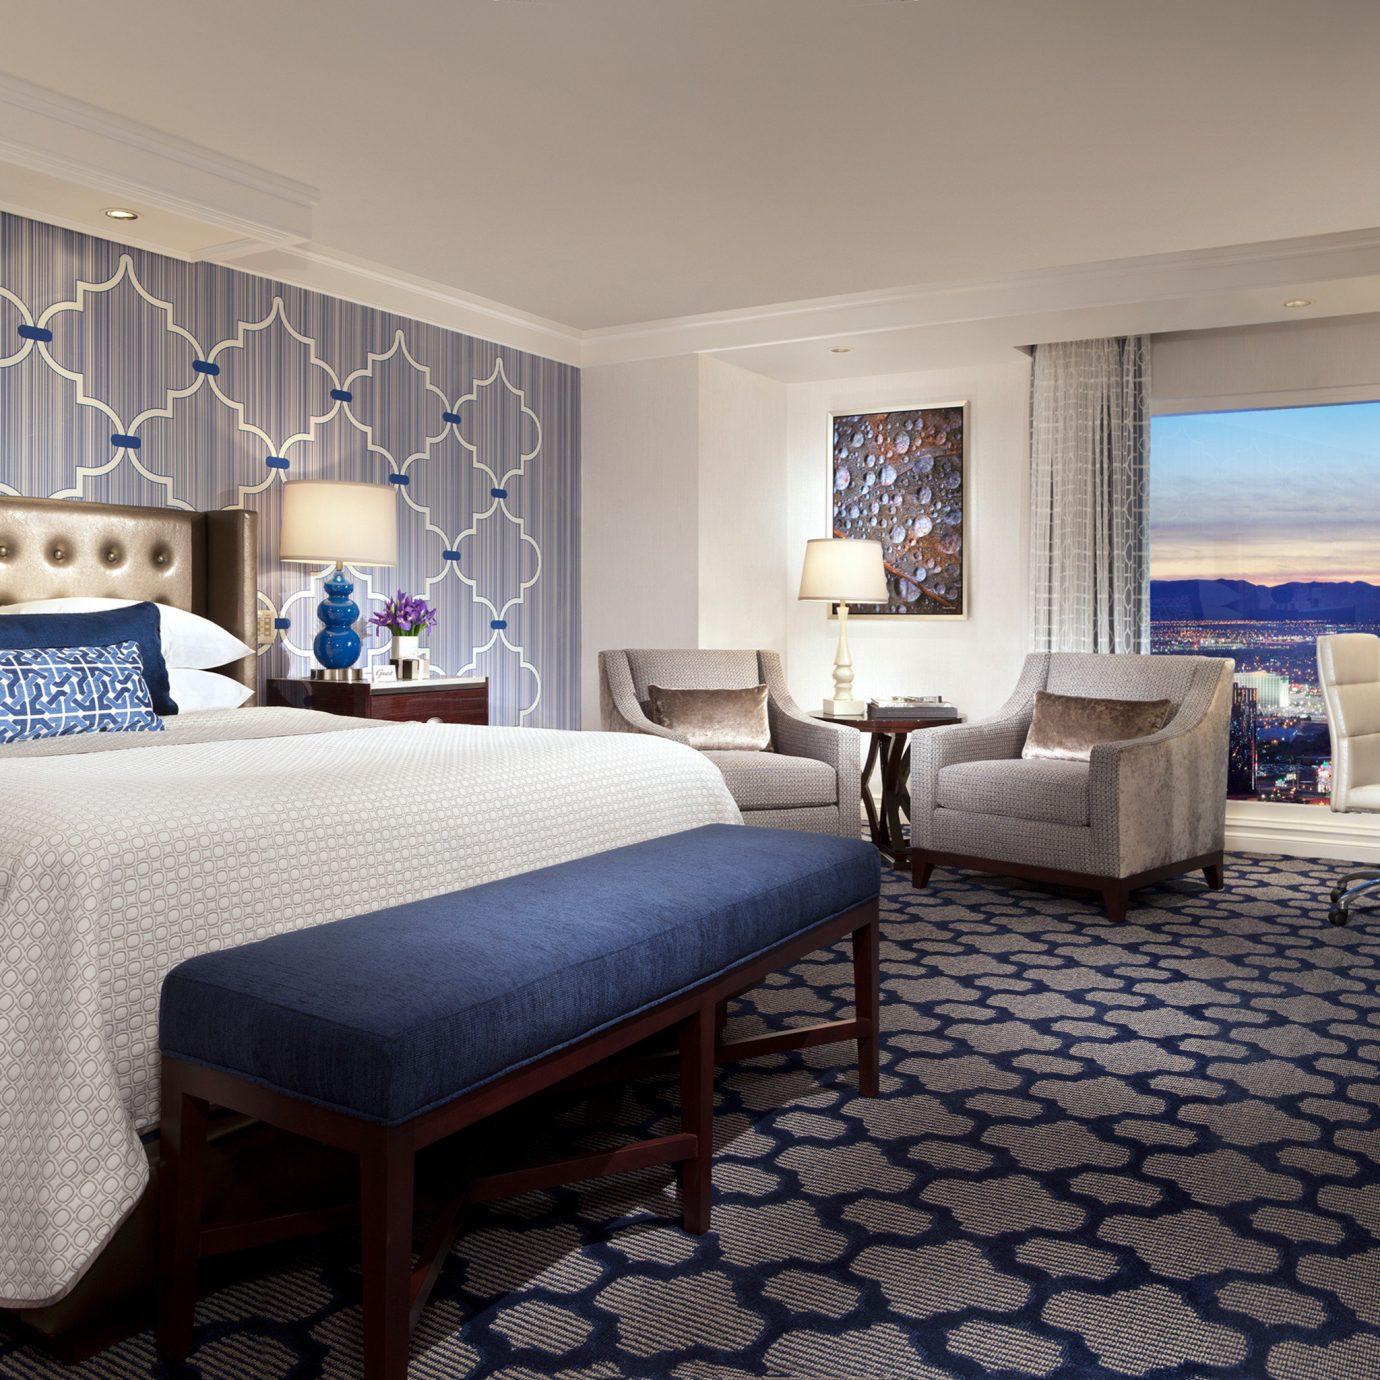 Bedroom Hip Hotels Luxury Modern Romance Suite property Resort home living room cottage Villa condominium